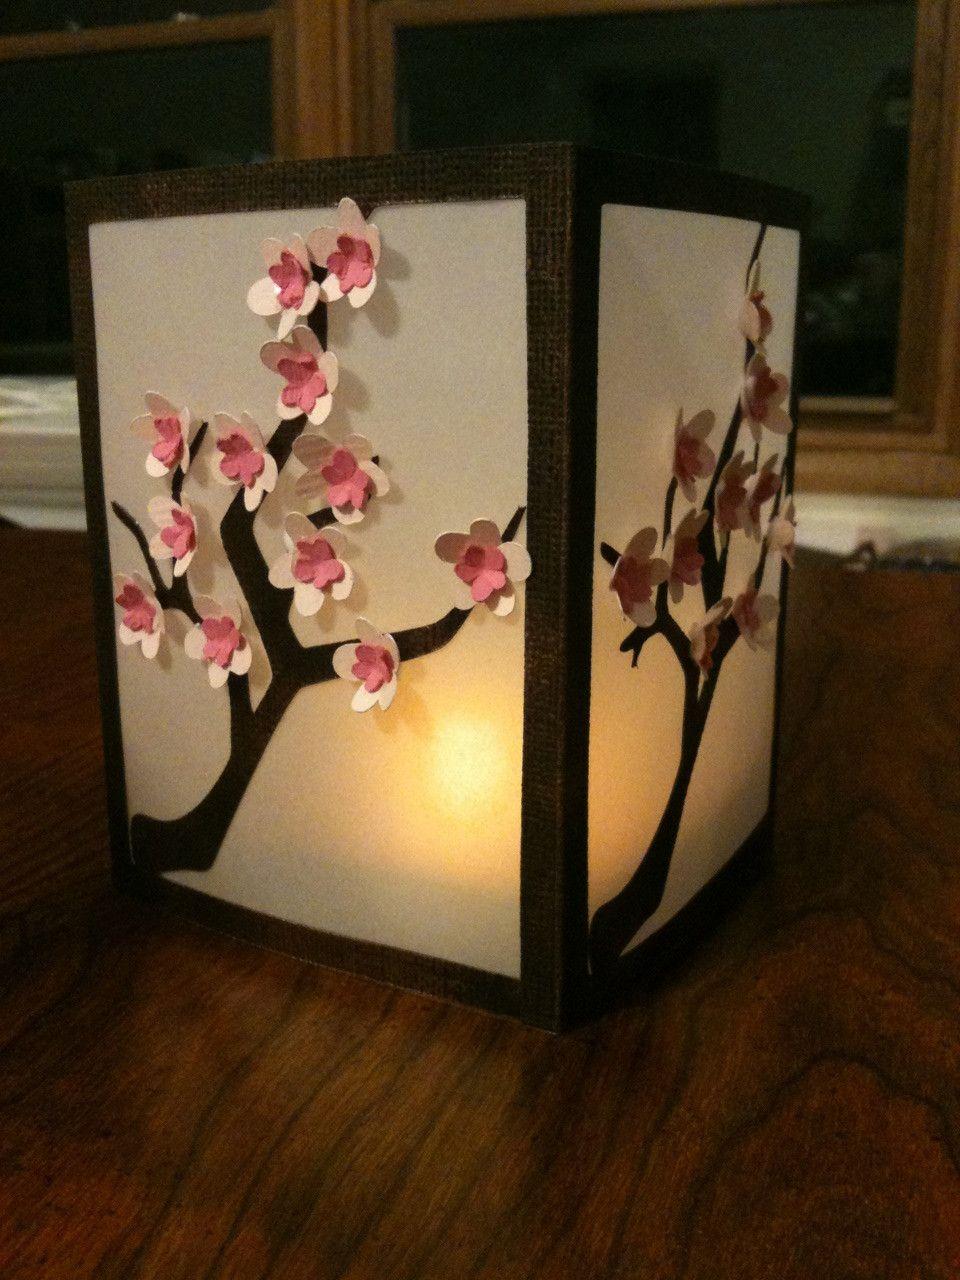 Beautiful Diy Cherry Blossom Luminary Using Cricut Dies By Kathy S Krafts Cherry Blossom Theme Cherry Blossom Party Asian Party